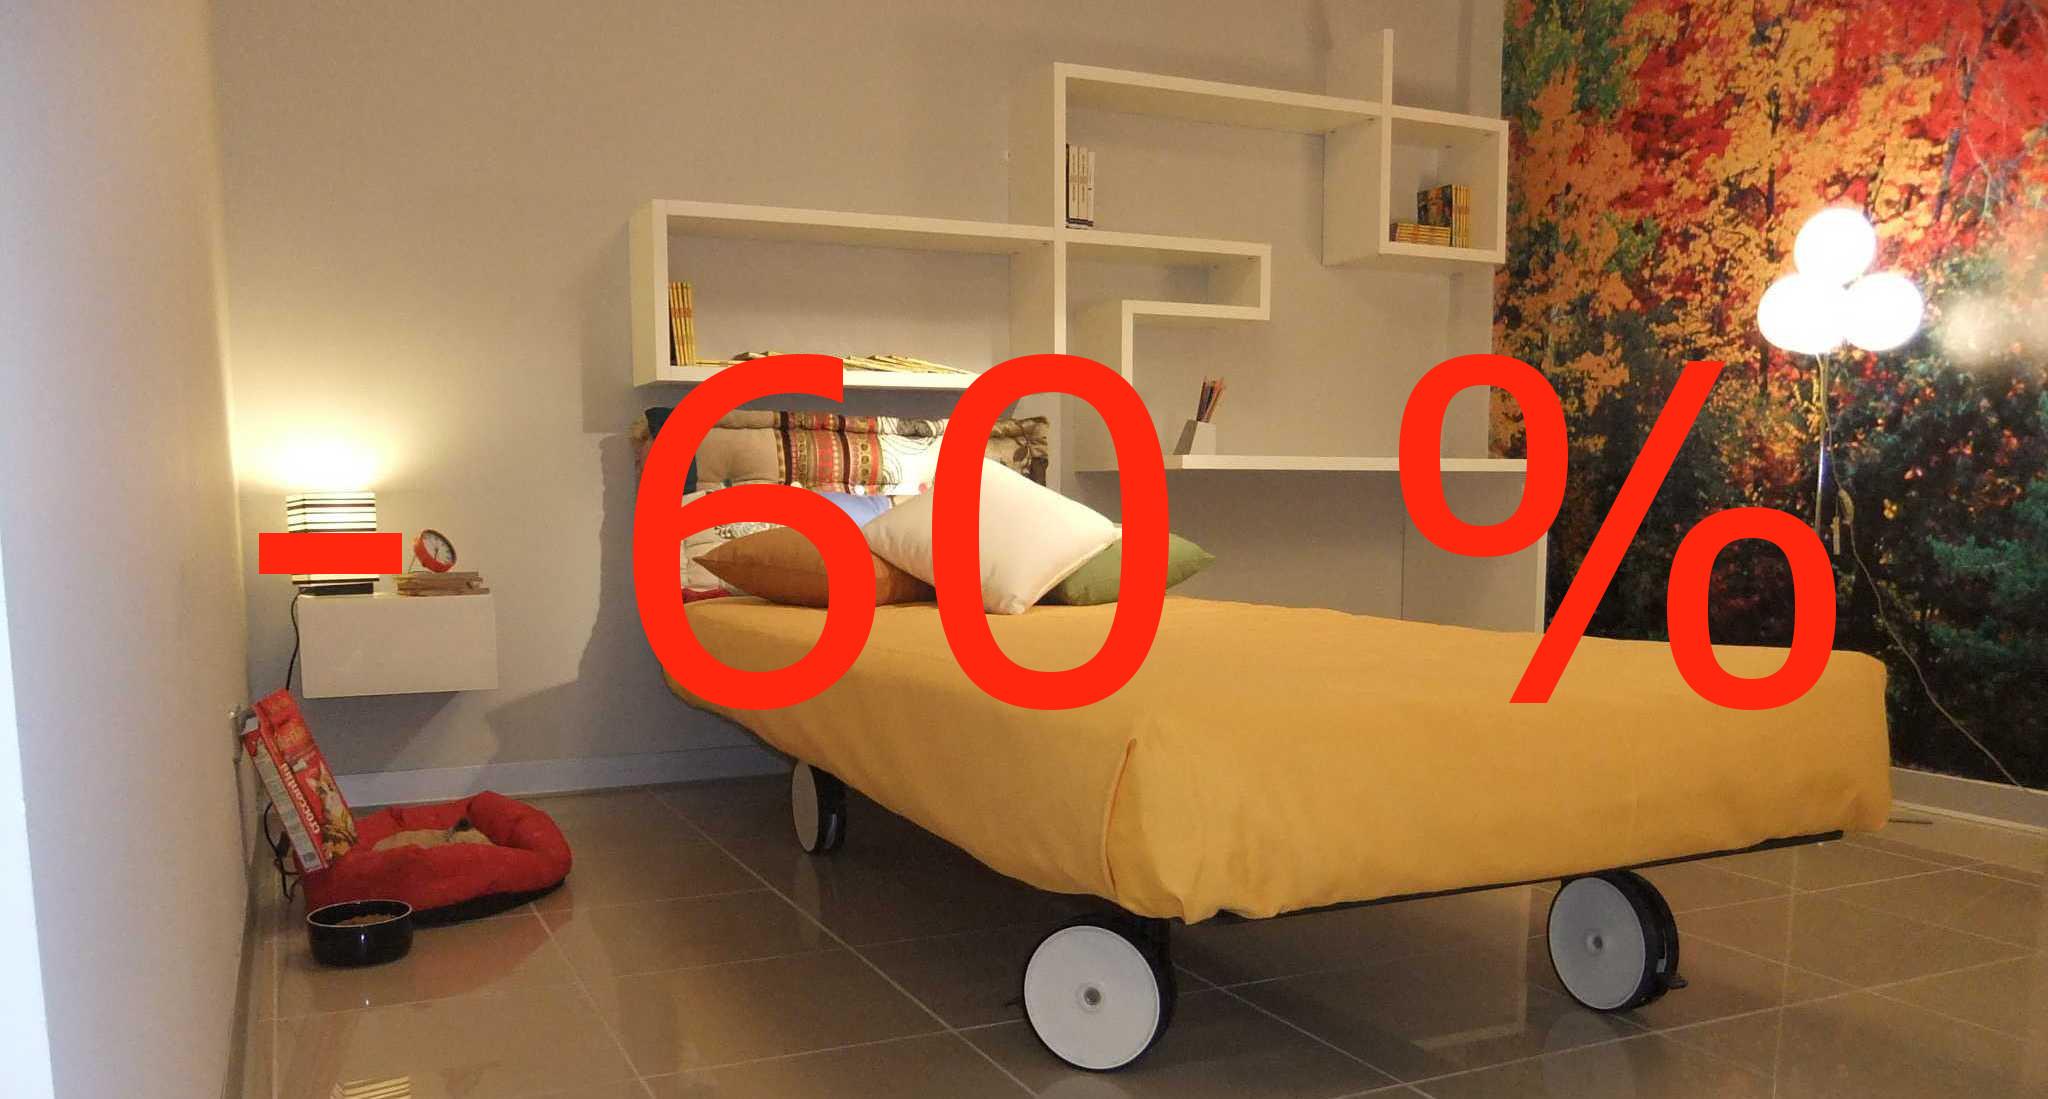 Outlet de espacio betty espacio betty muebles de dise o en madrid - Outlet de muebles en madrid ...